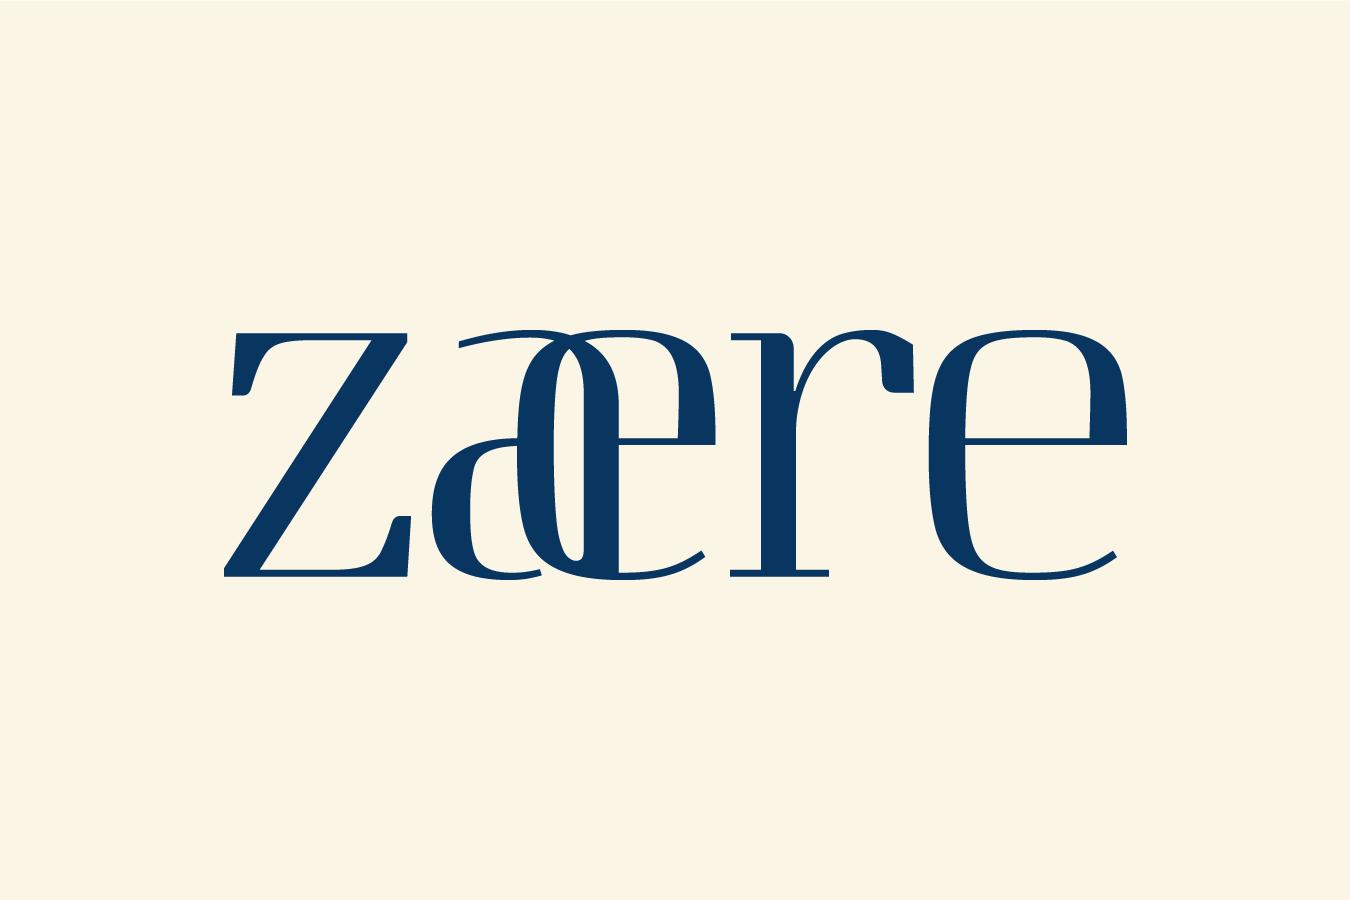 zaere-logo